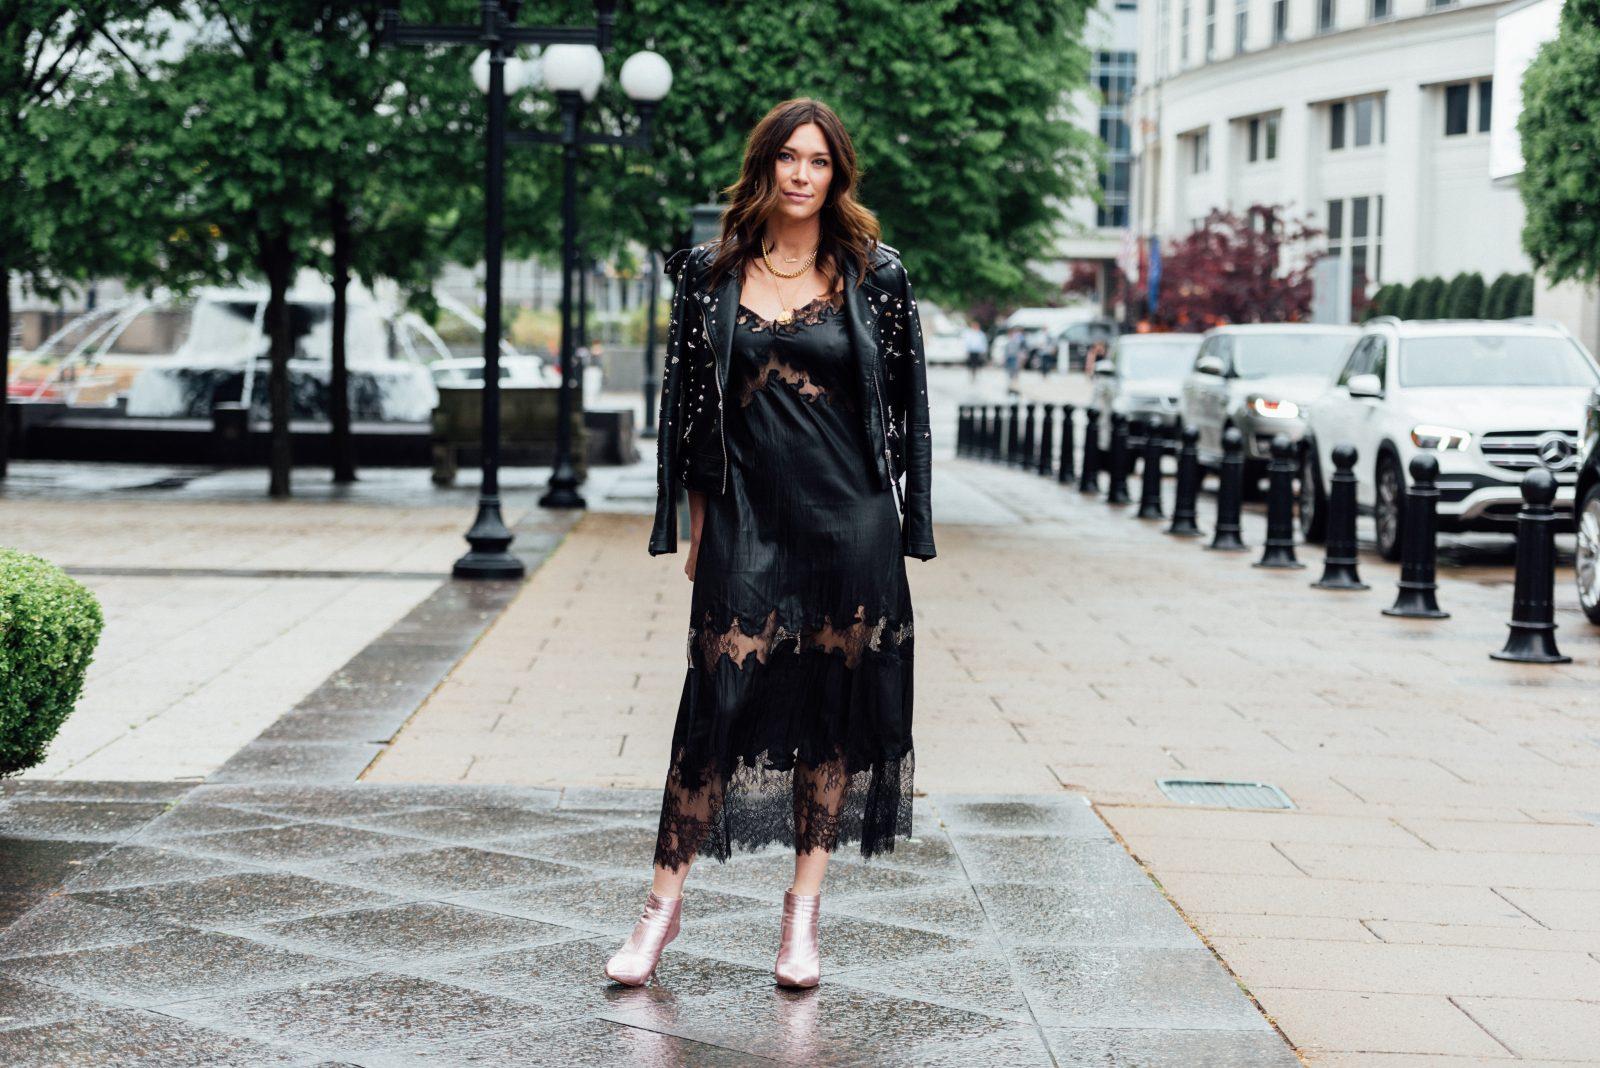 Jessica Biel at the Symphony Fashion Show 2021